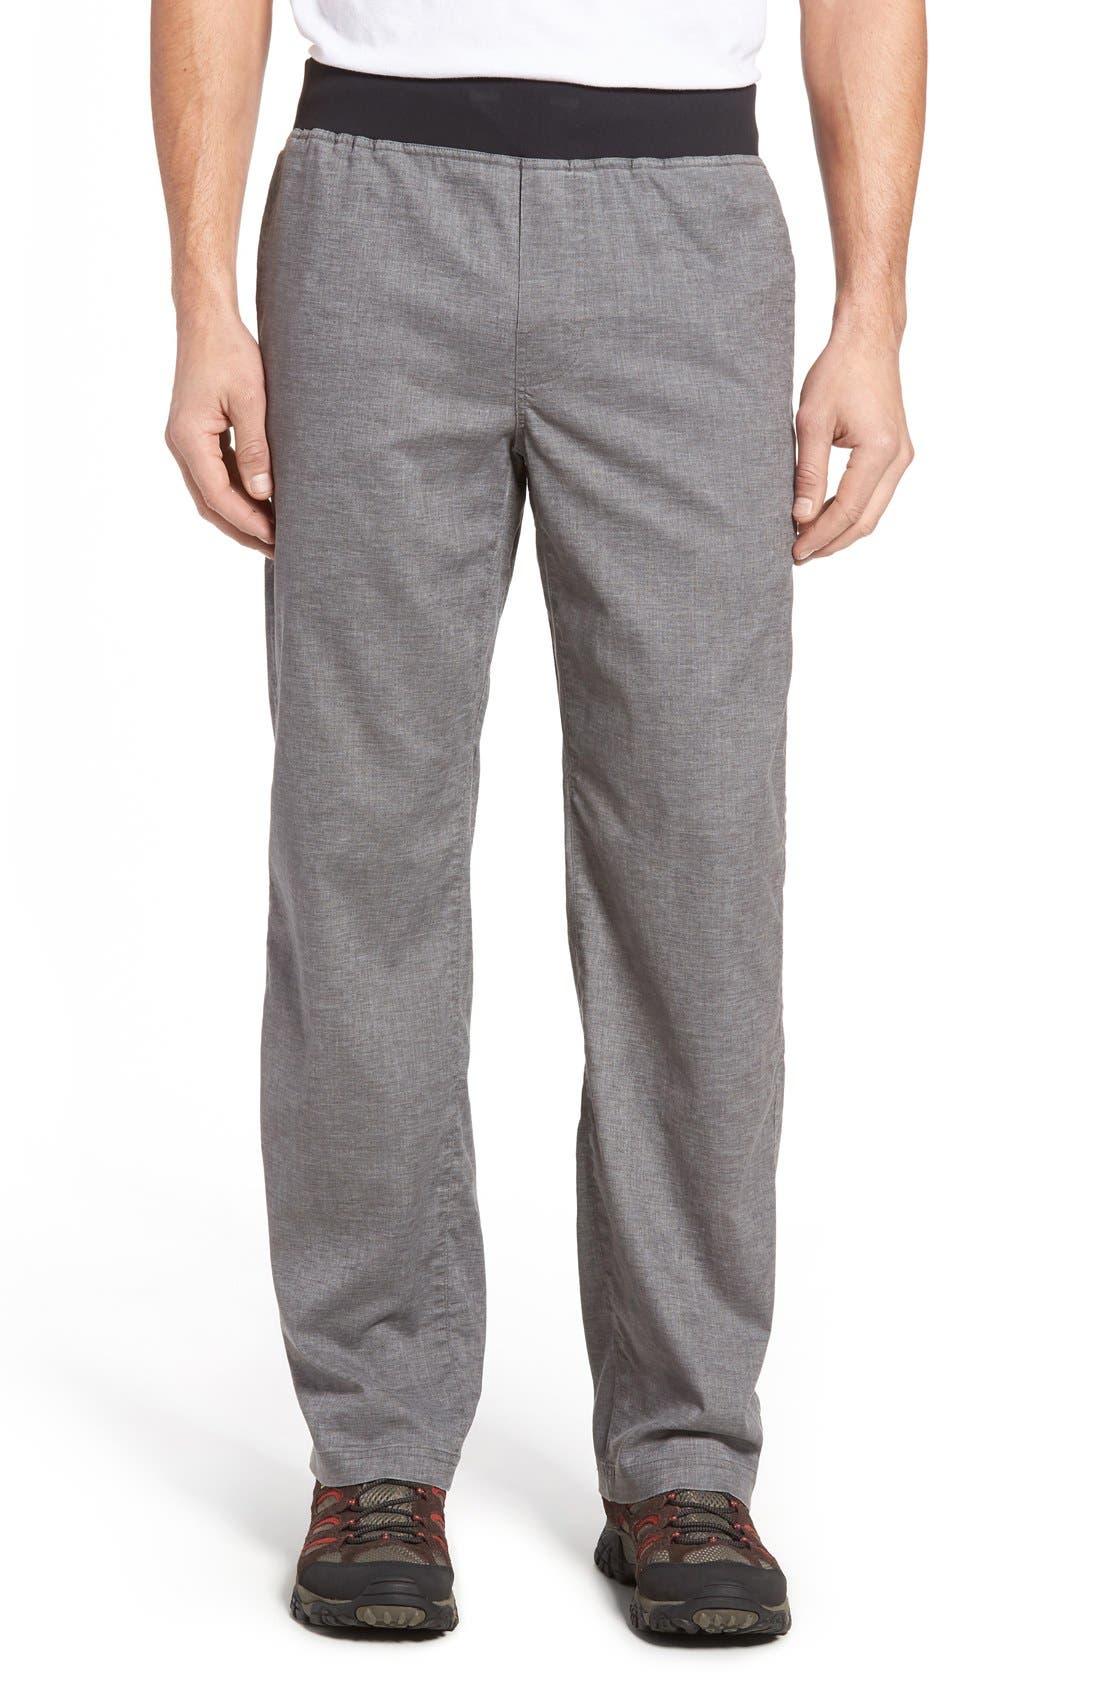 Vaha Pants,                         Main,                         color, Gravel